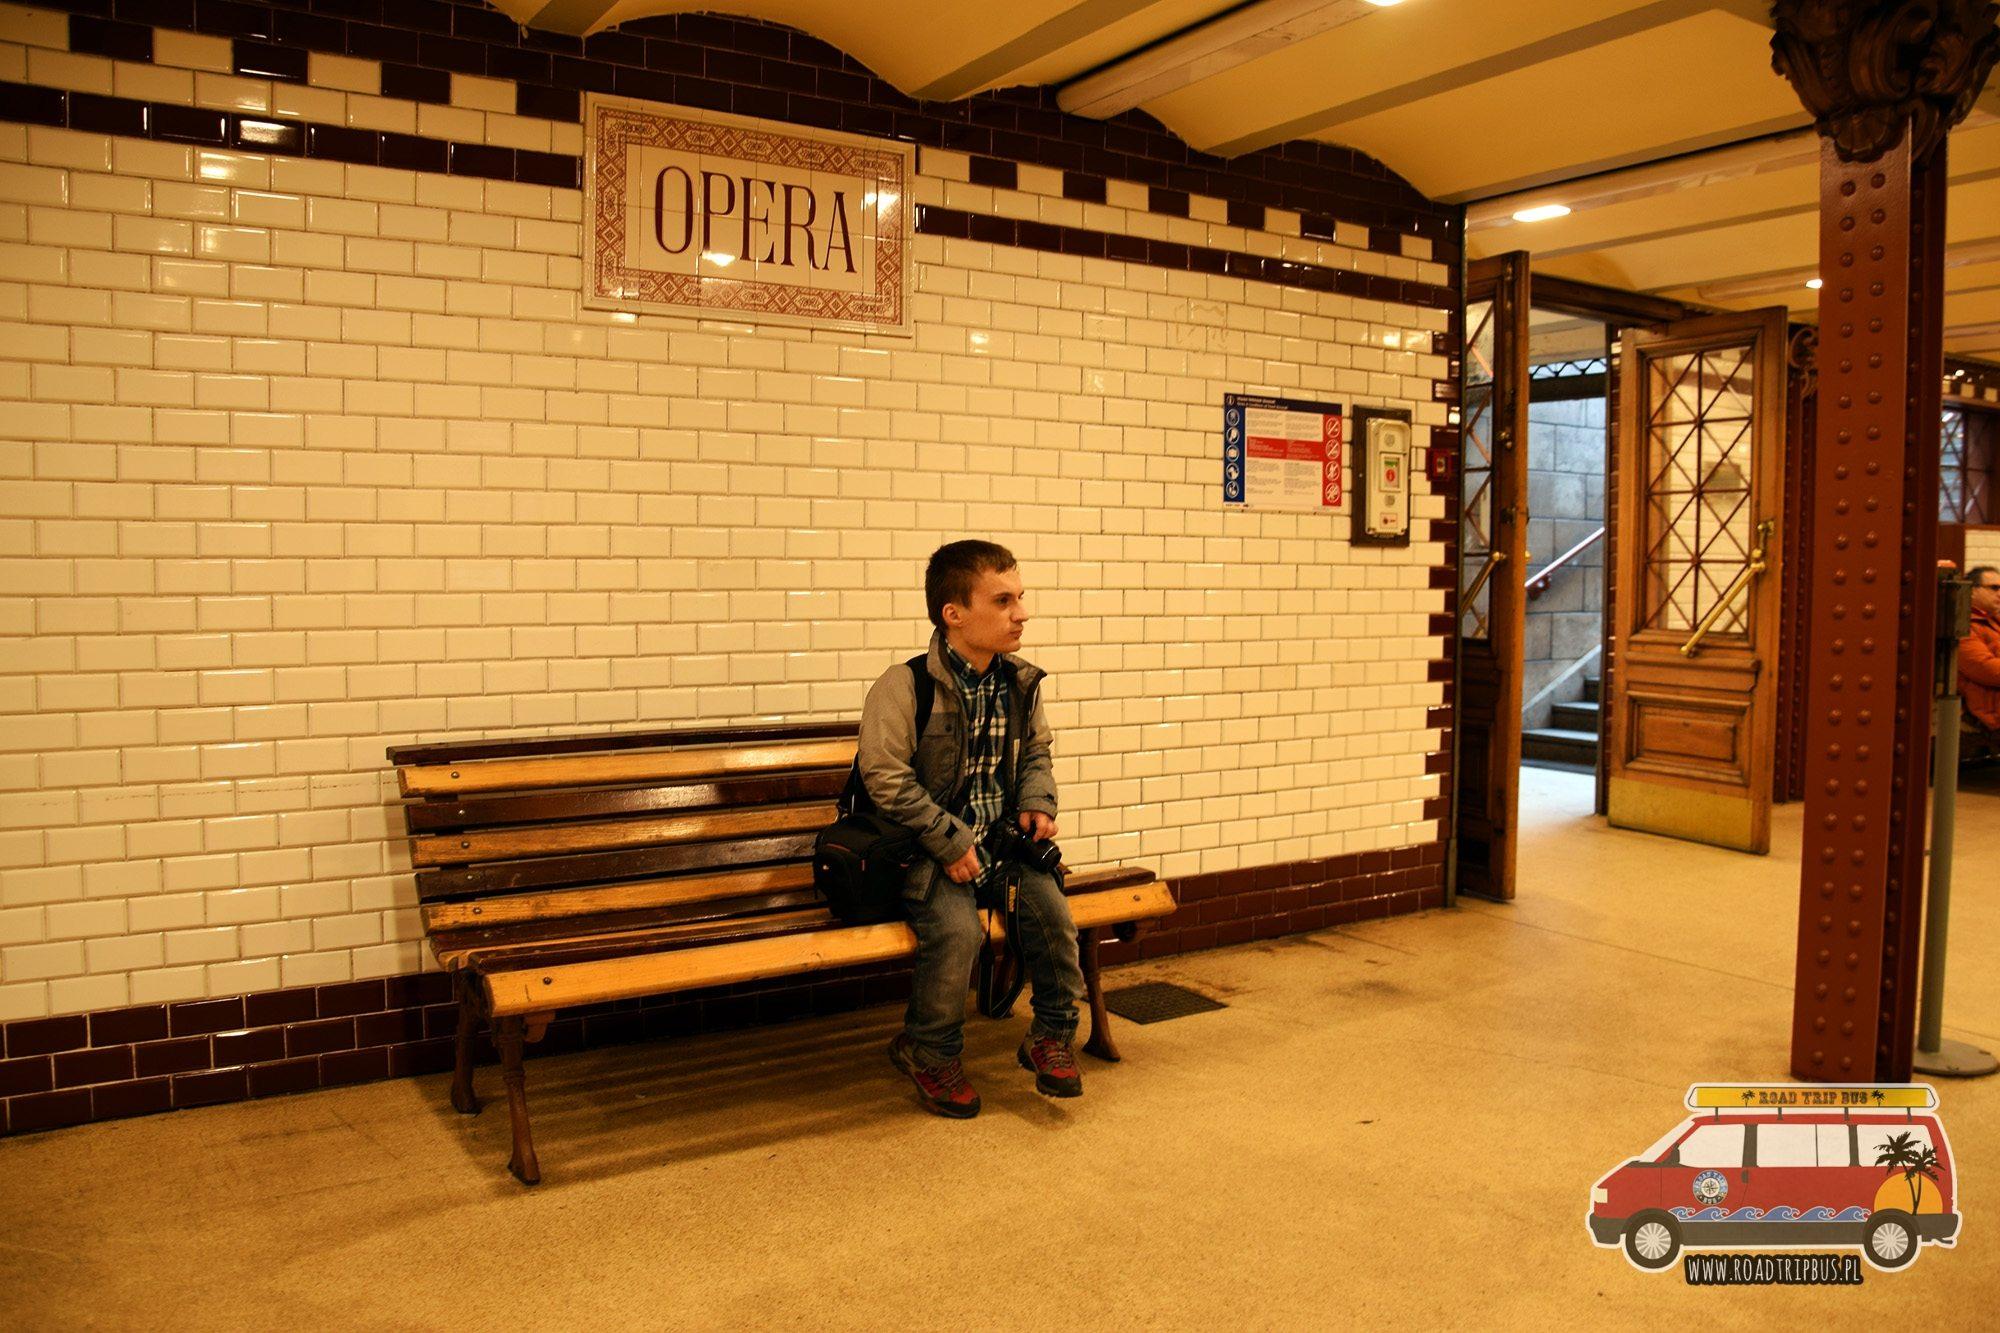 Opera Budapeszt Metro